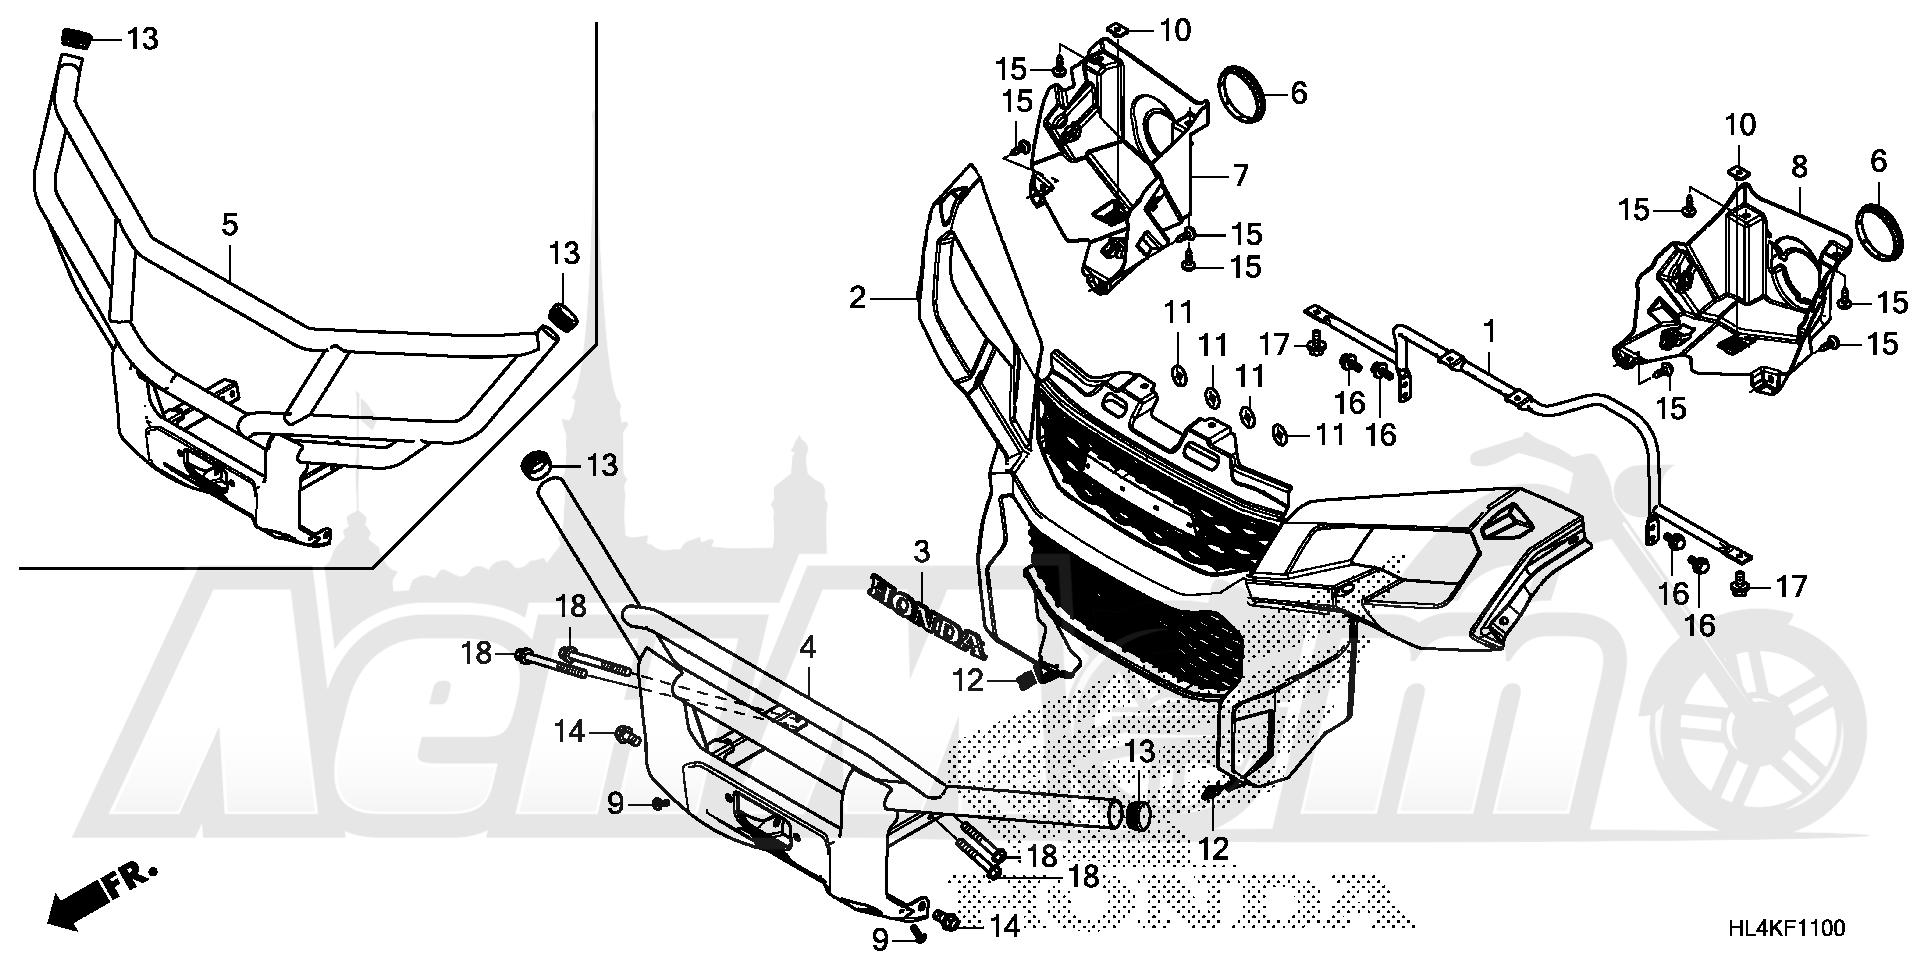 Запчасти для Квадроцикла Honda 2019 SXS1000M5P Раздел: FRONT GRILLE AND FRONT BUMPER | перед GRILLE и перед бампер